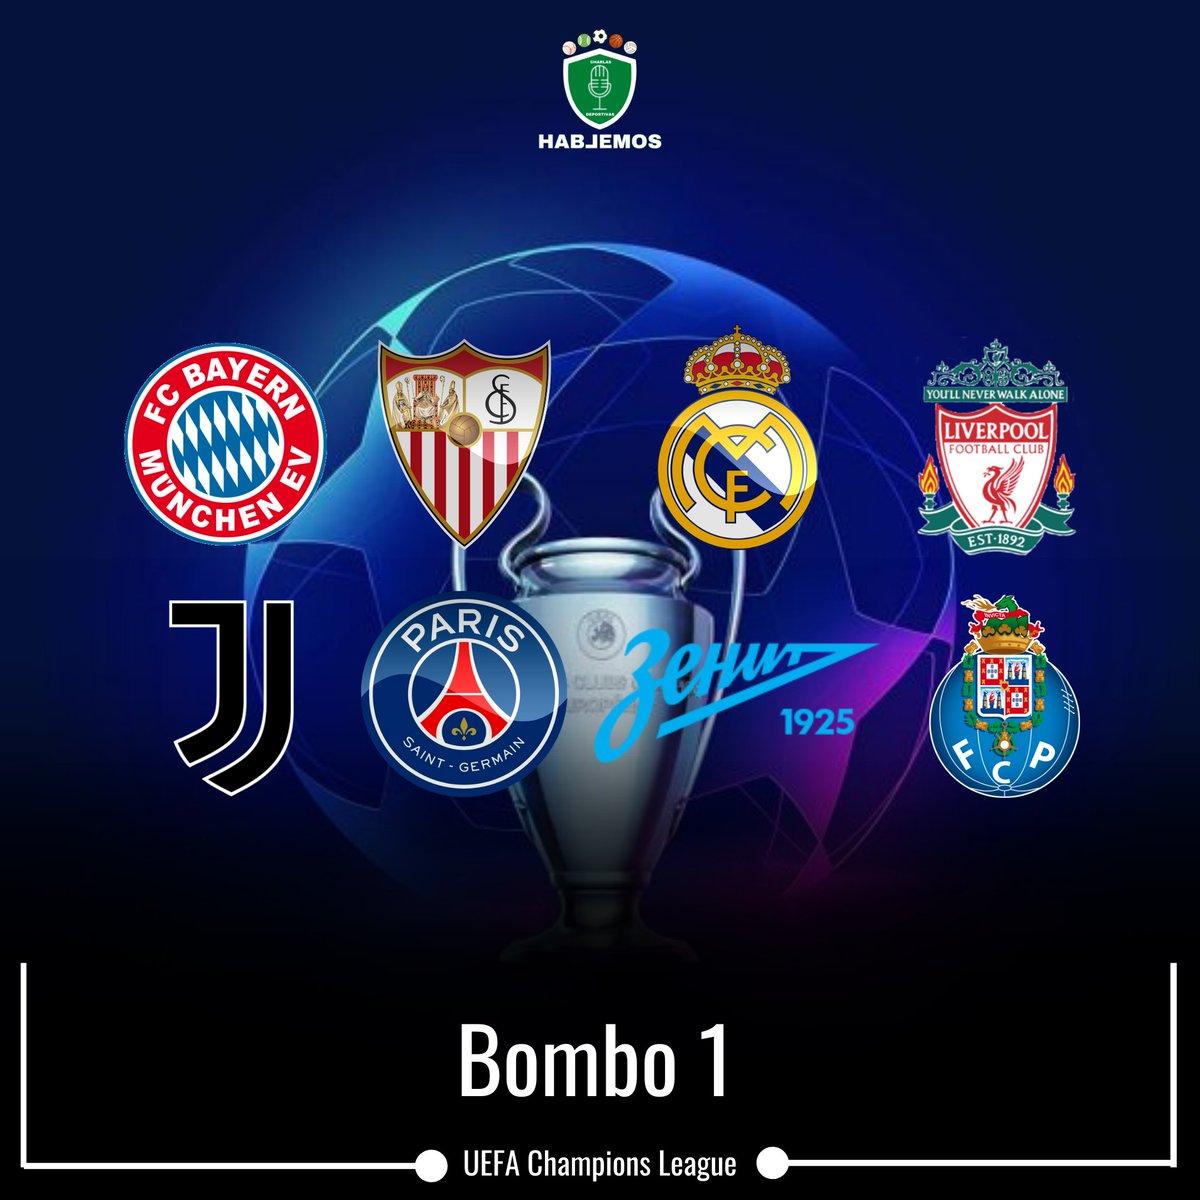 ►Bombo 1: #Bayern (🇩🇪 Campeón de la UEFA Champions League) #Sevilla (🇪🇸 campeón de la UEFA Europa League), #RealMadrid (🇪🇸), #Liverpool (🏴), #Juventus (🇮🇹), #PSG (🇫🇷), #Zenit (🇷🇺), Oporto (🇵🇹) https://t.co/rhVcIv5pzD